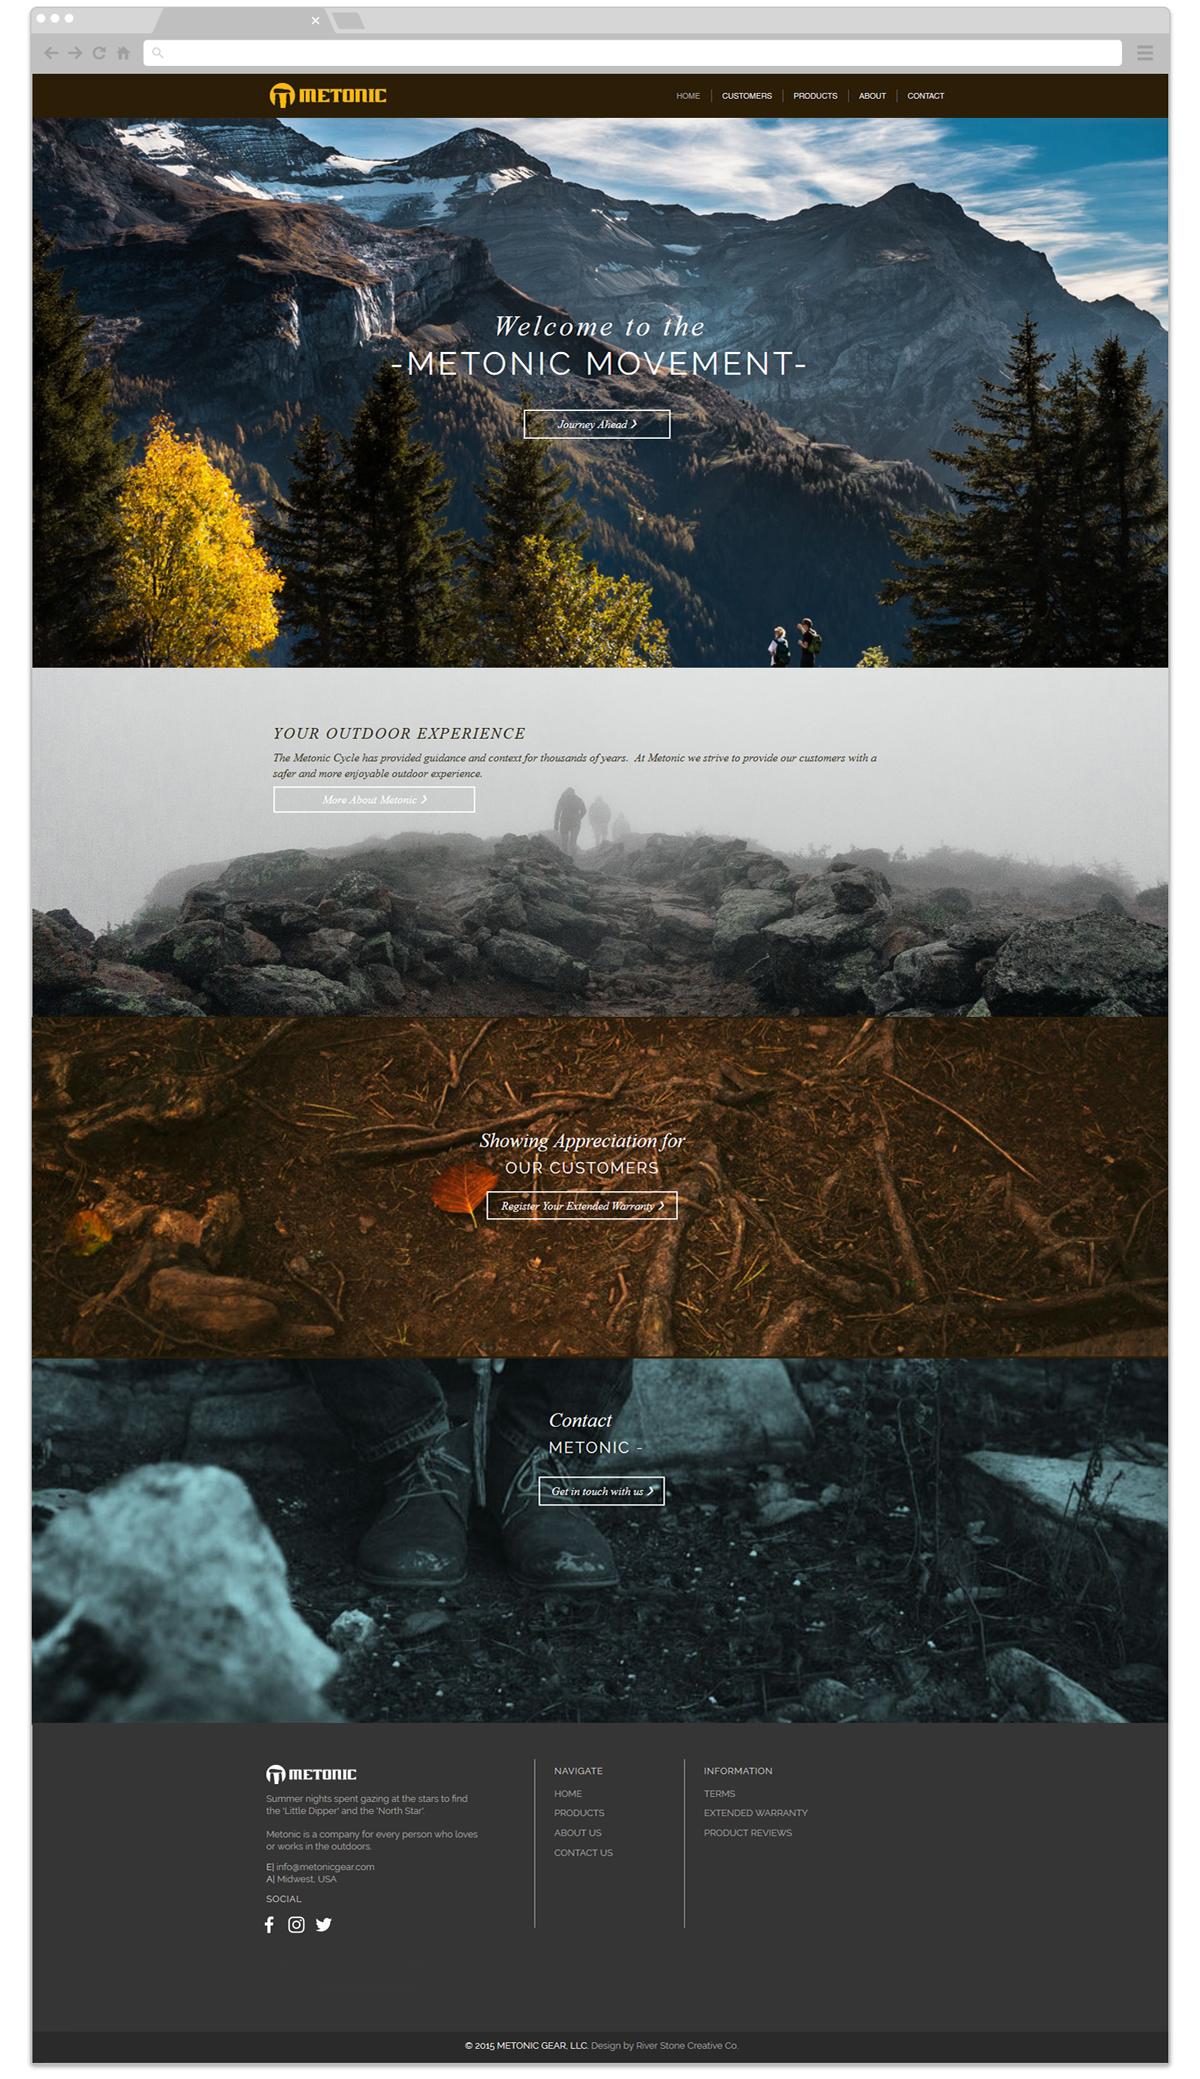 River-Stone-Creative-Co-Websites-Metonic-Gear